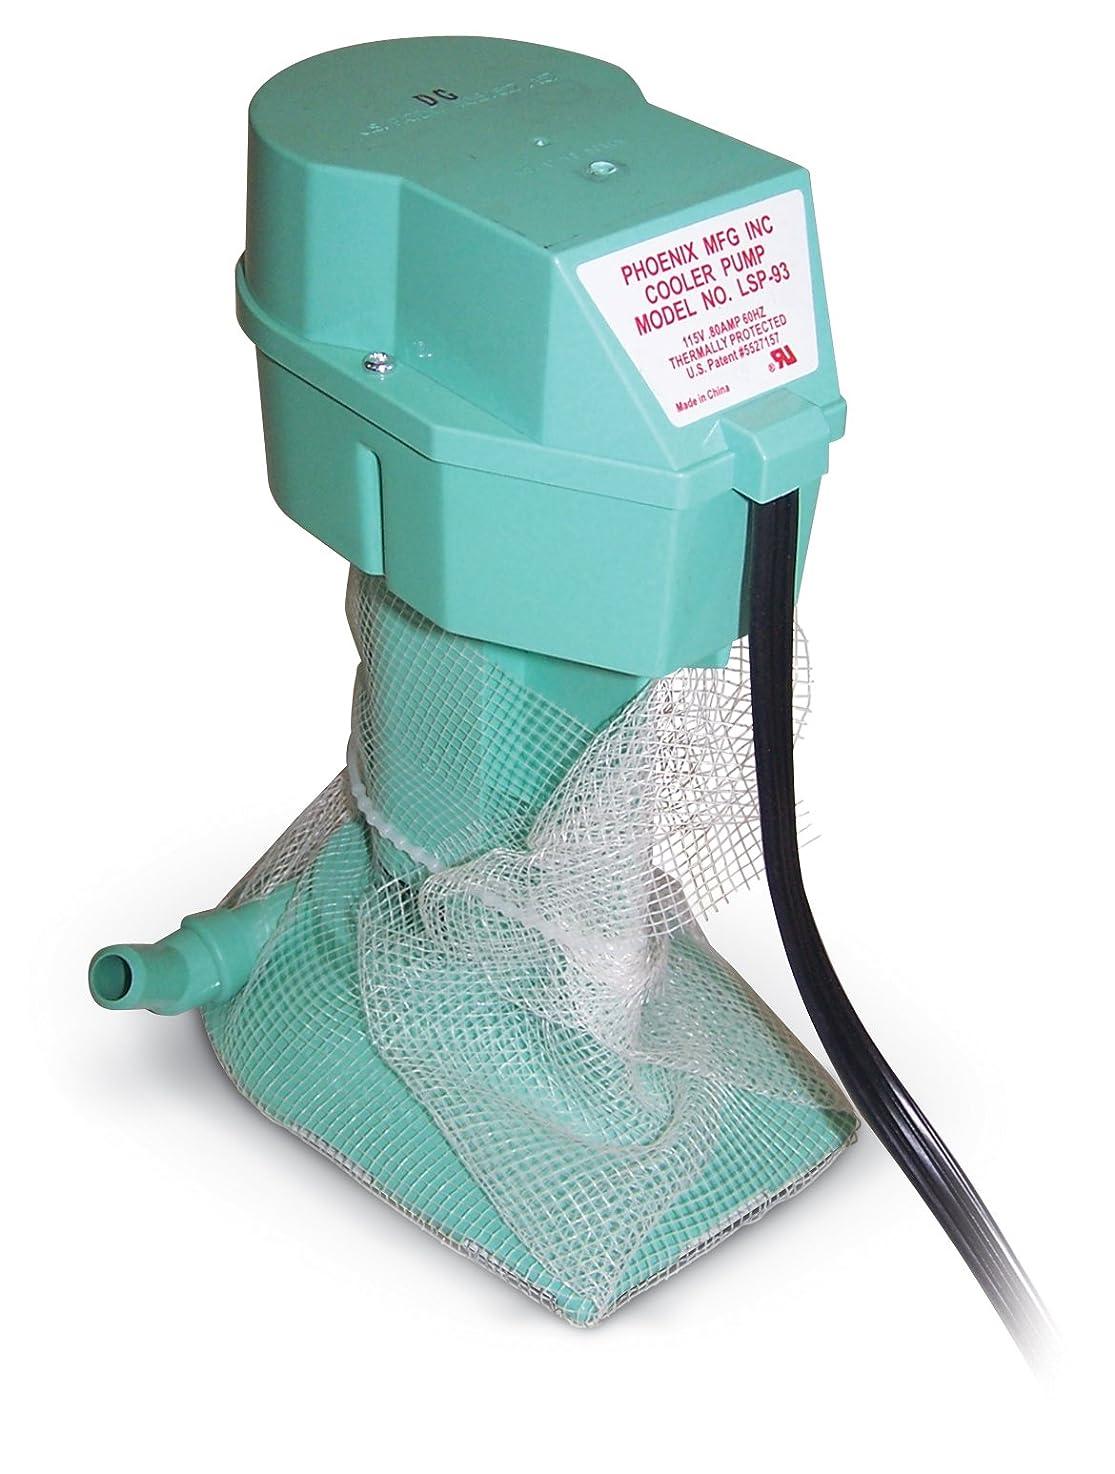 Phoenix Manufacturing 05-006-0034 120V Cooler Recirculation Pump for Residential Evaporative Coolers evezxpnxtnify7